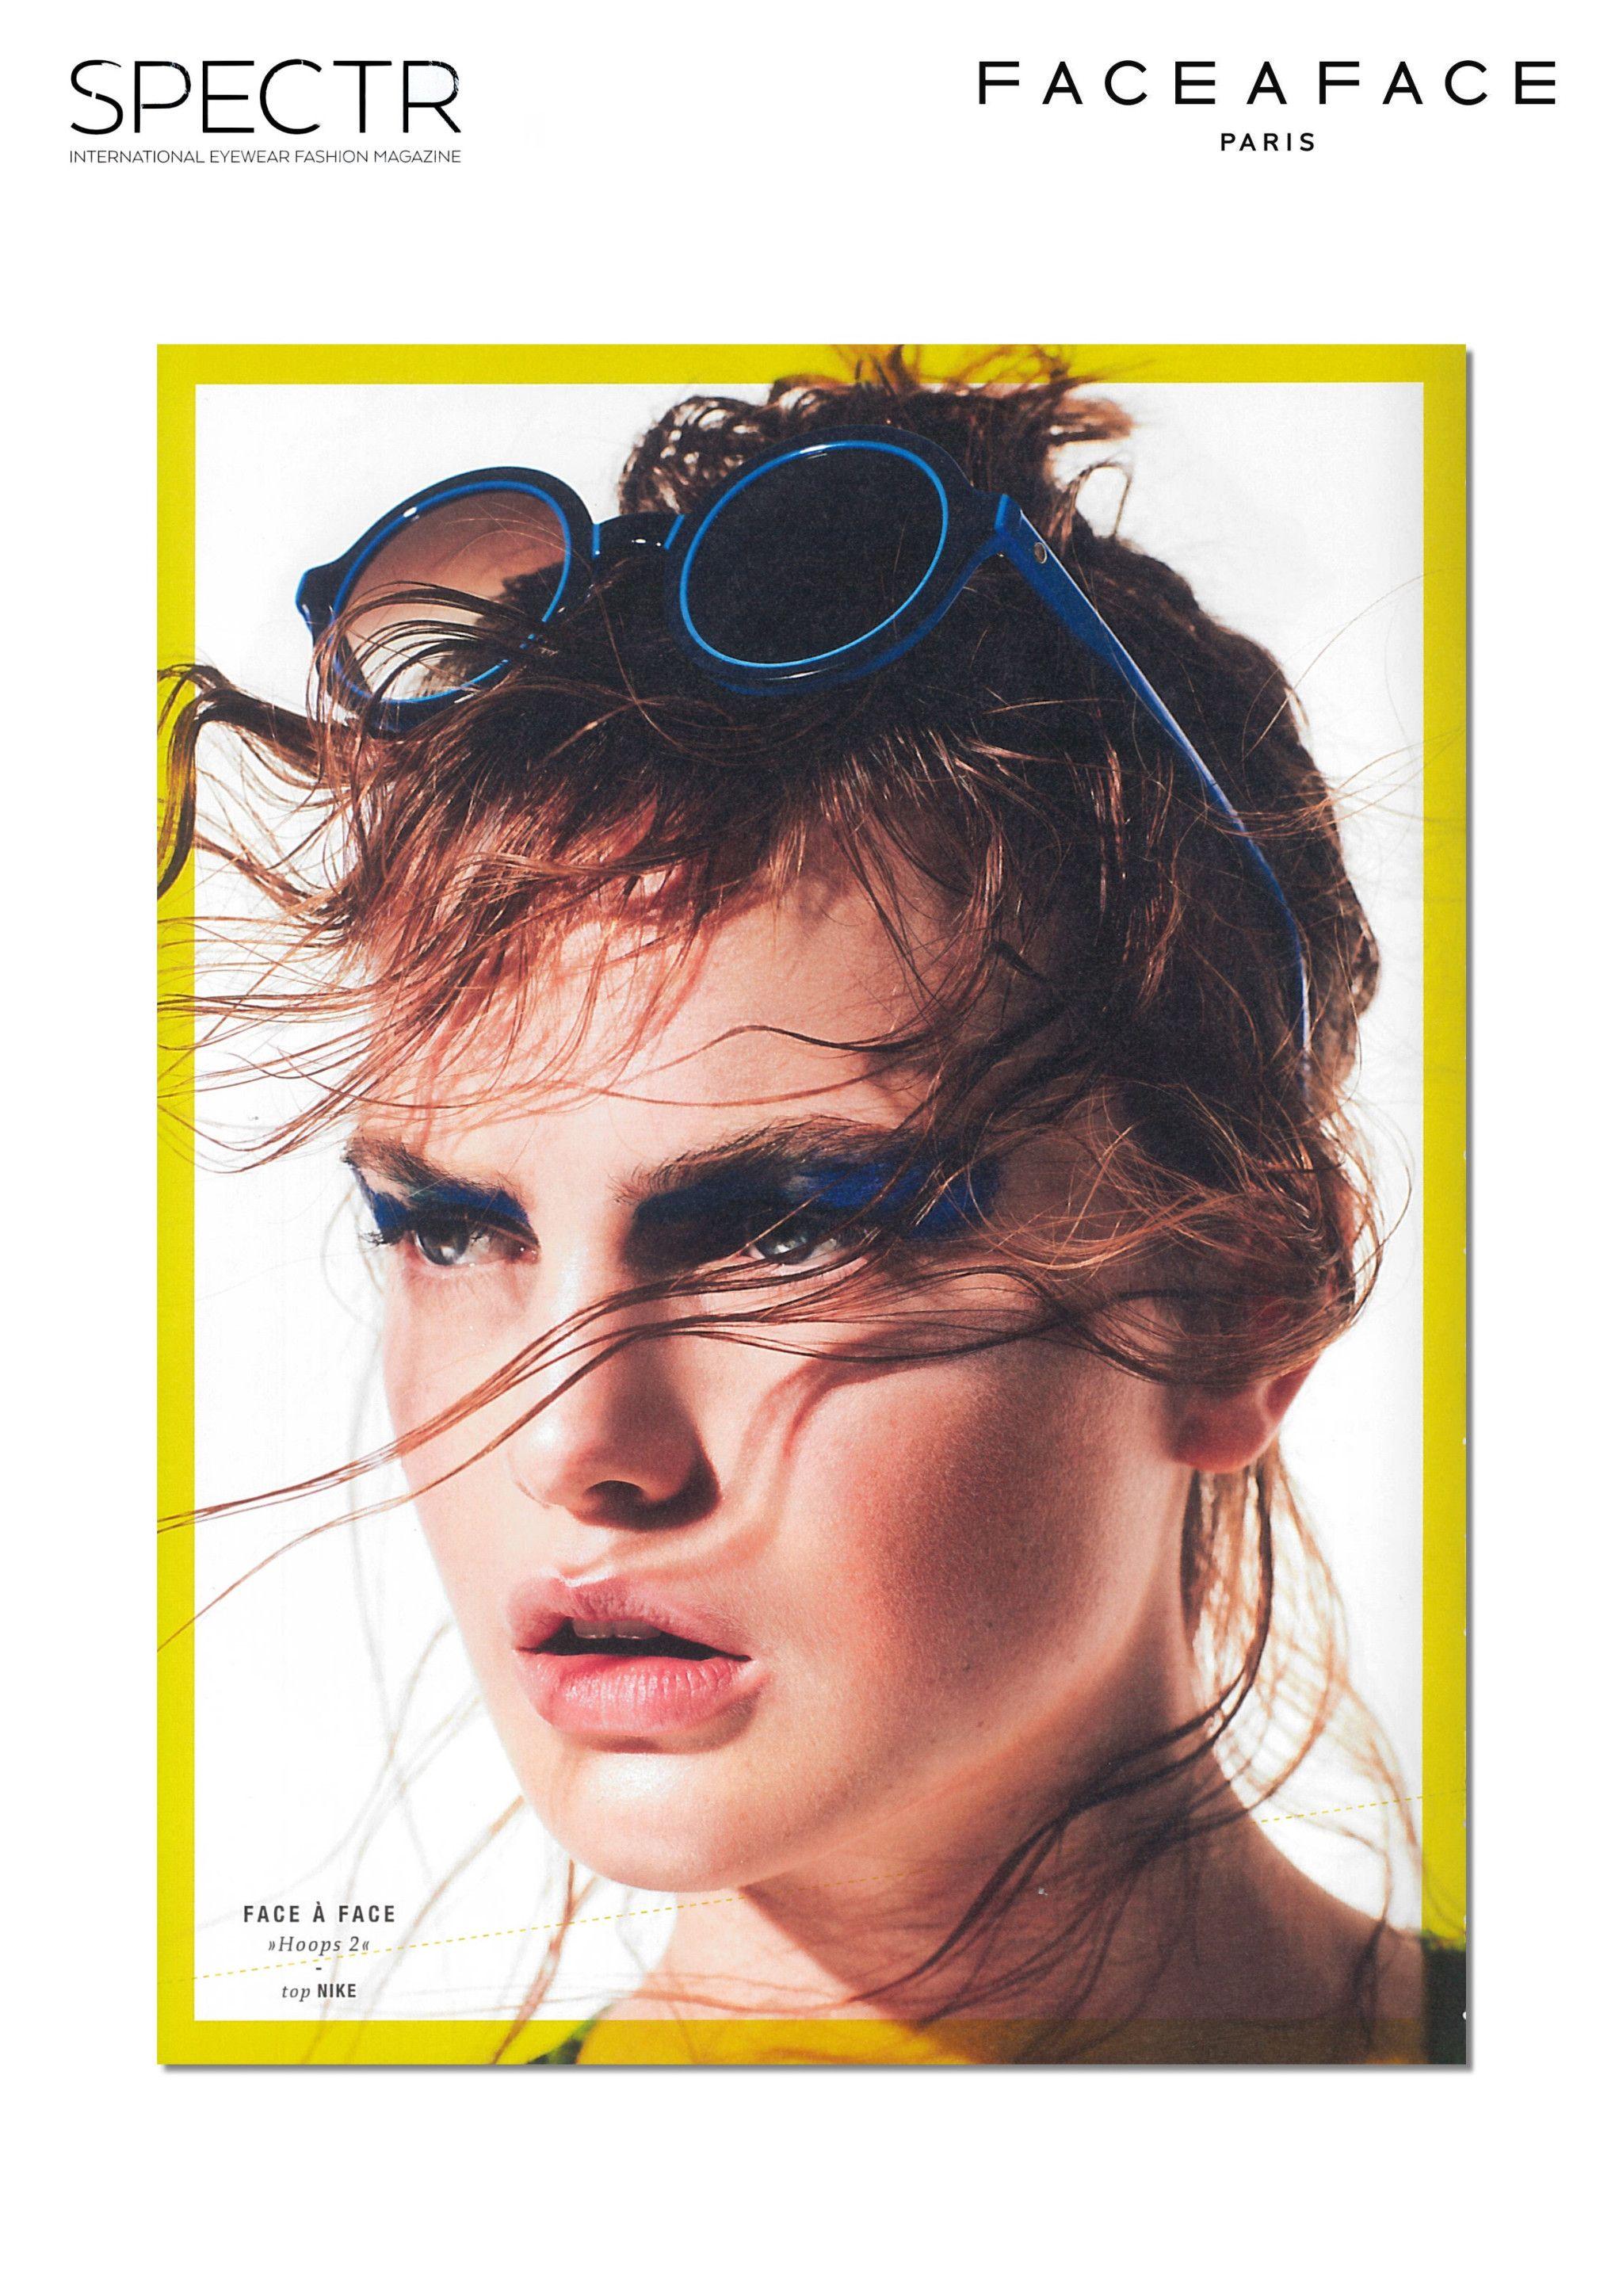 FACE A FACE in SPECTRE - Design Eyewear Group   Lunettes   Pinterest ... e6edfd5f57e6